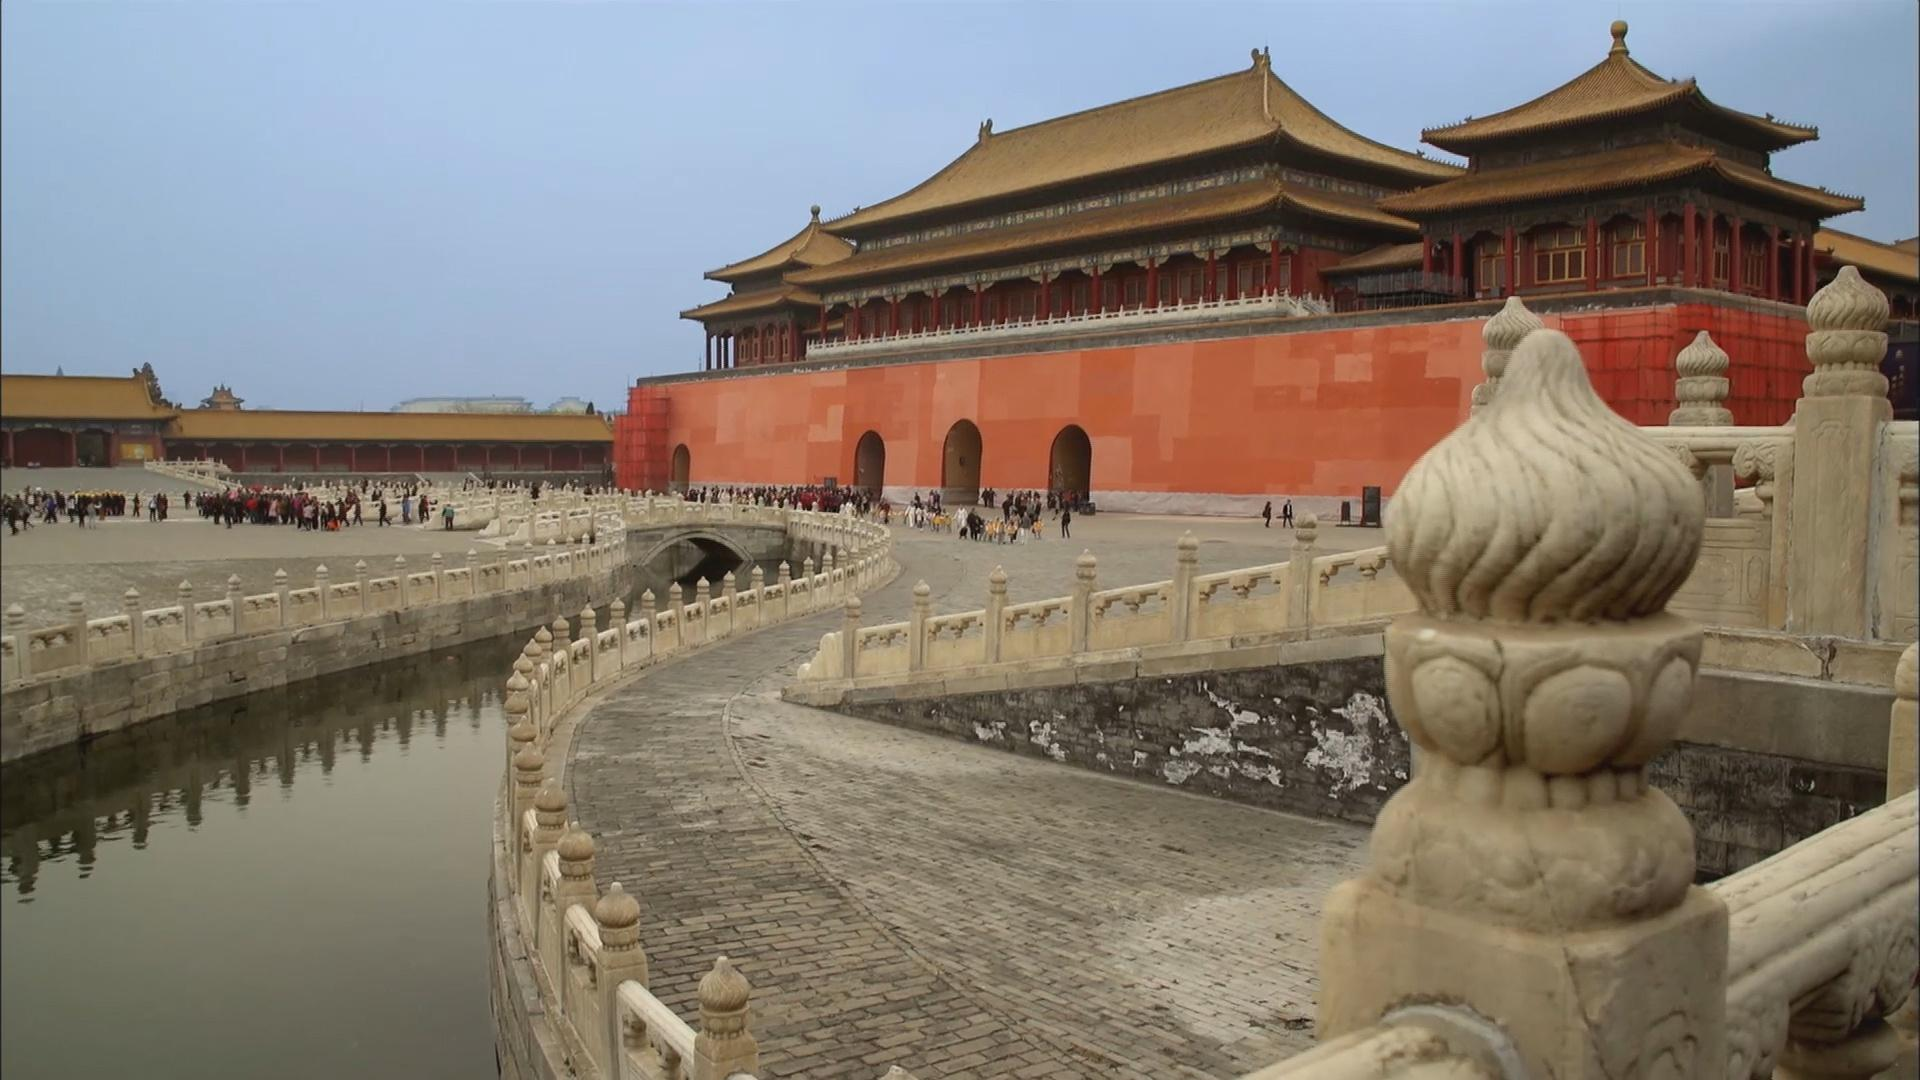 Forbidden City Facts